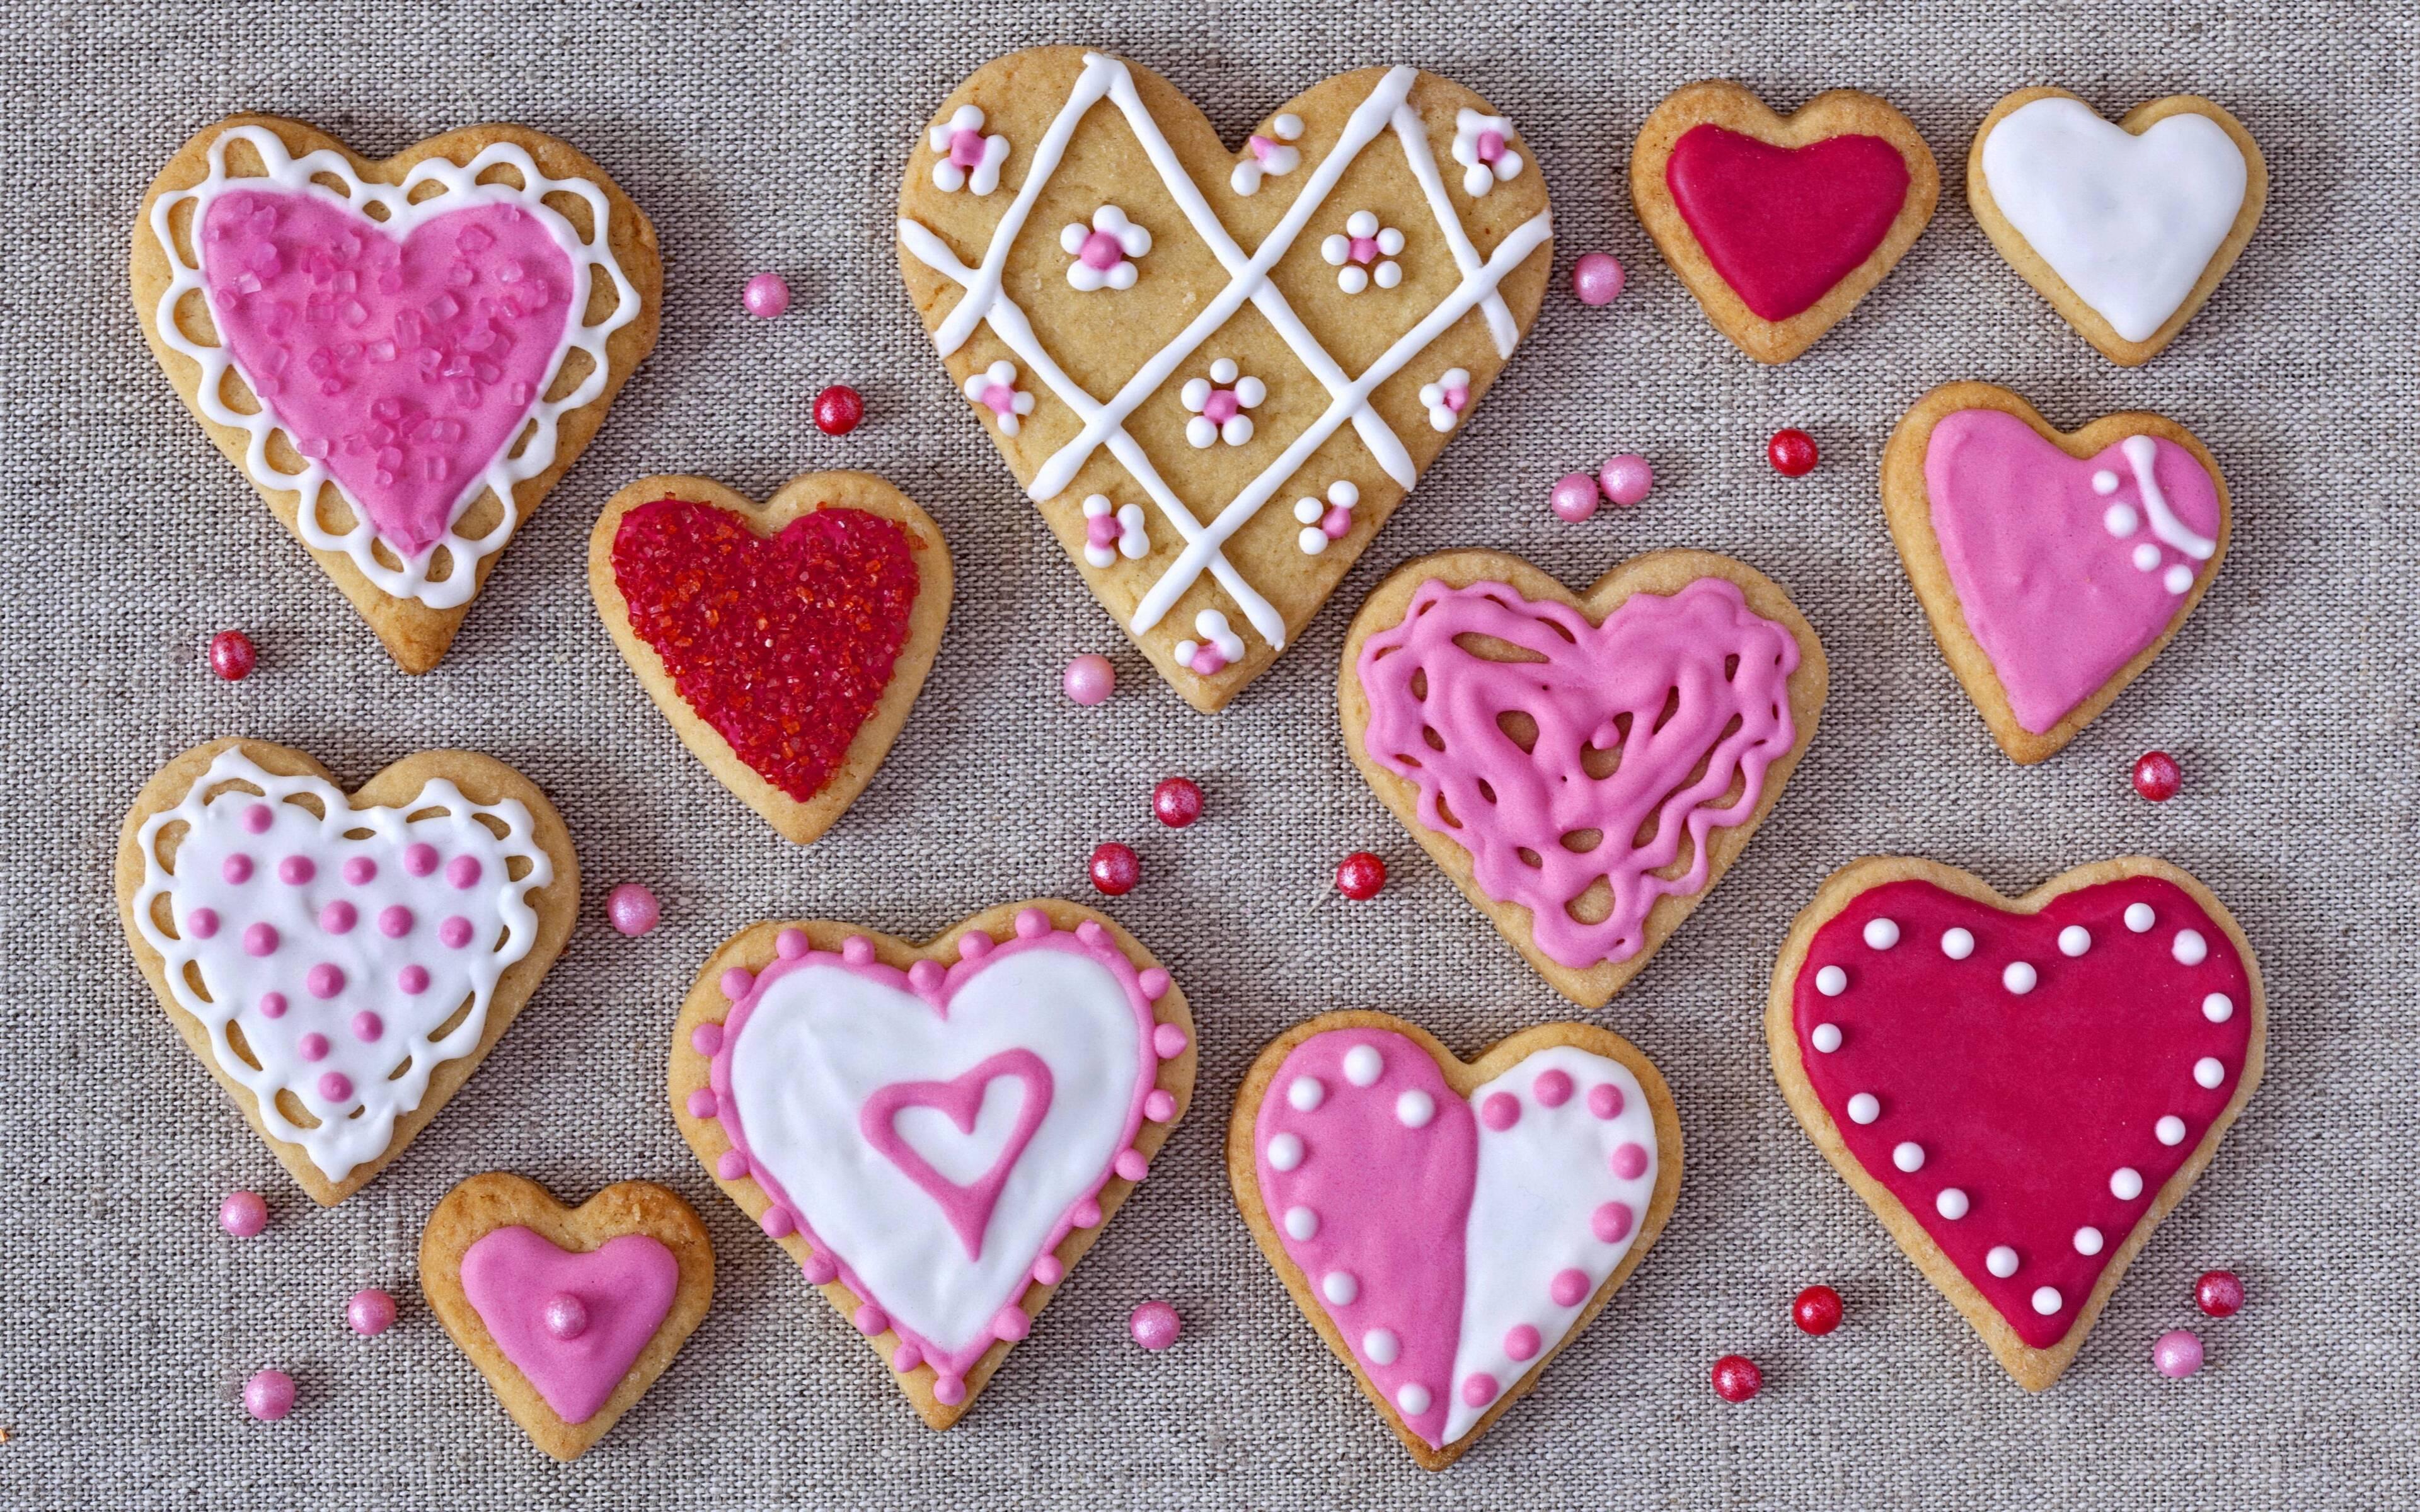 pink-color-heart-shaped-cookies-hd.jpg